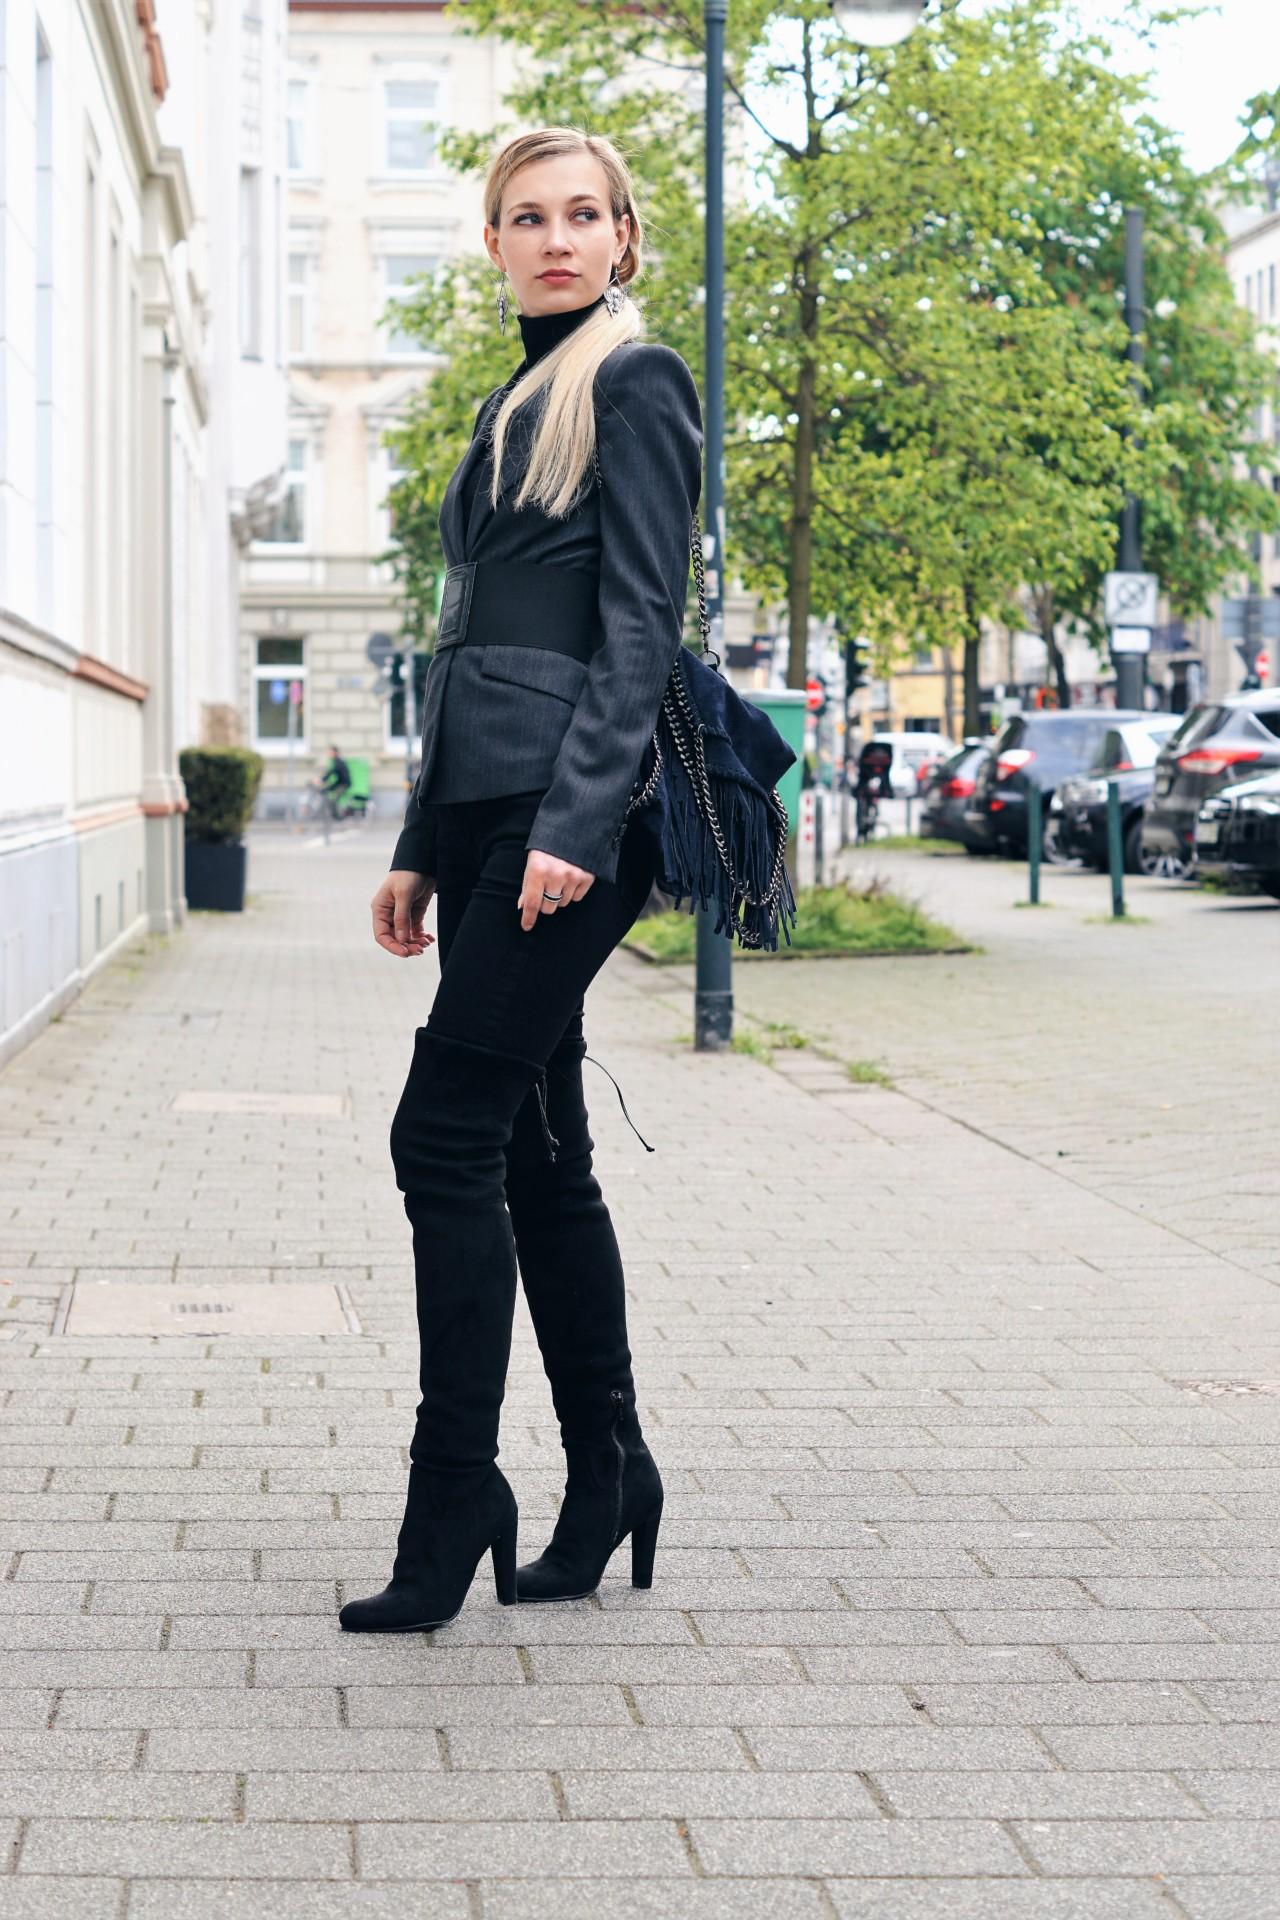 dbkstylez_hugo_boss_fashion_street_style_bestblog_fashion-inspiration_how_to